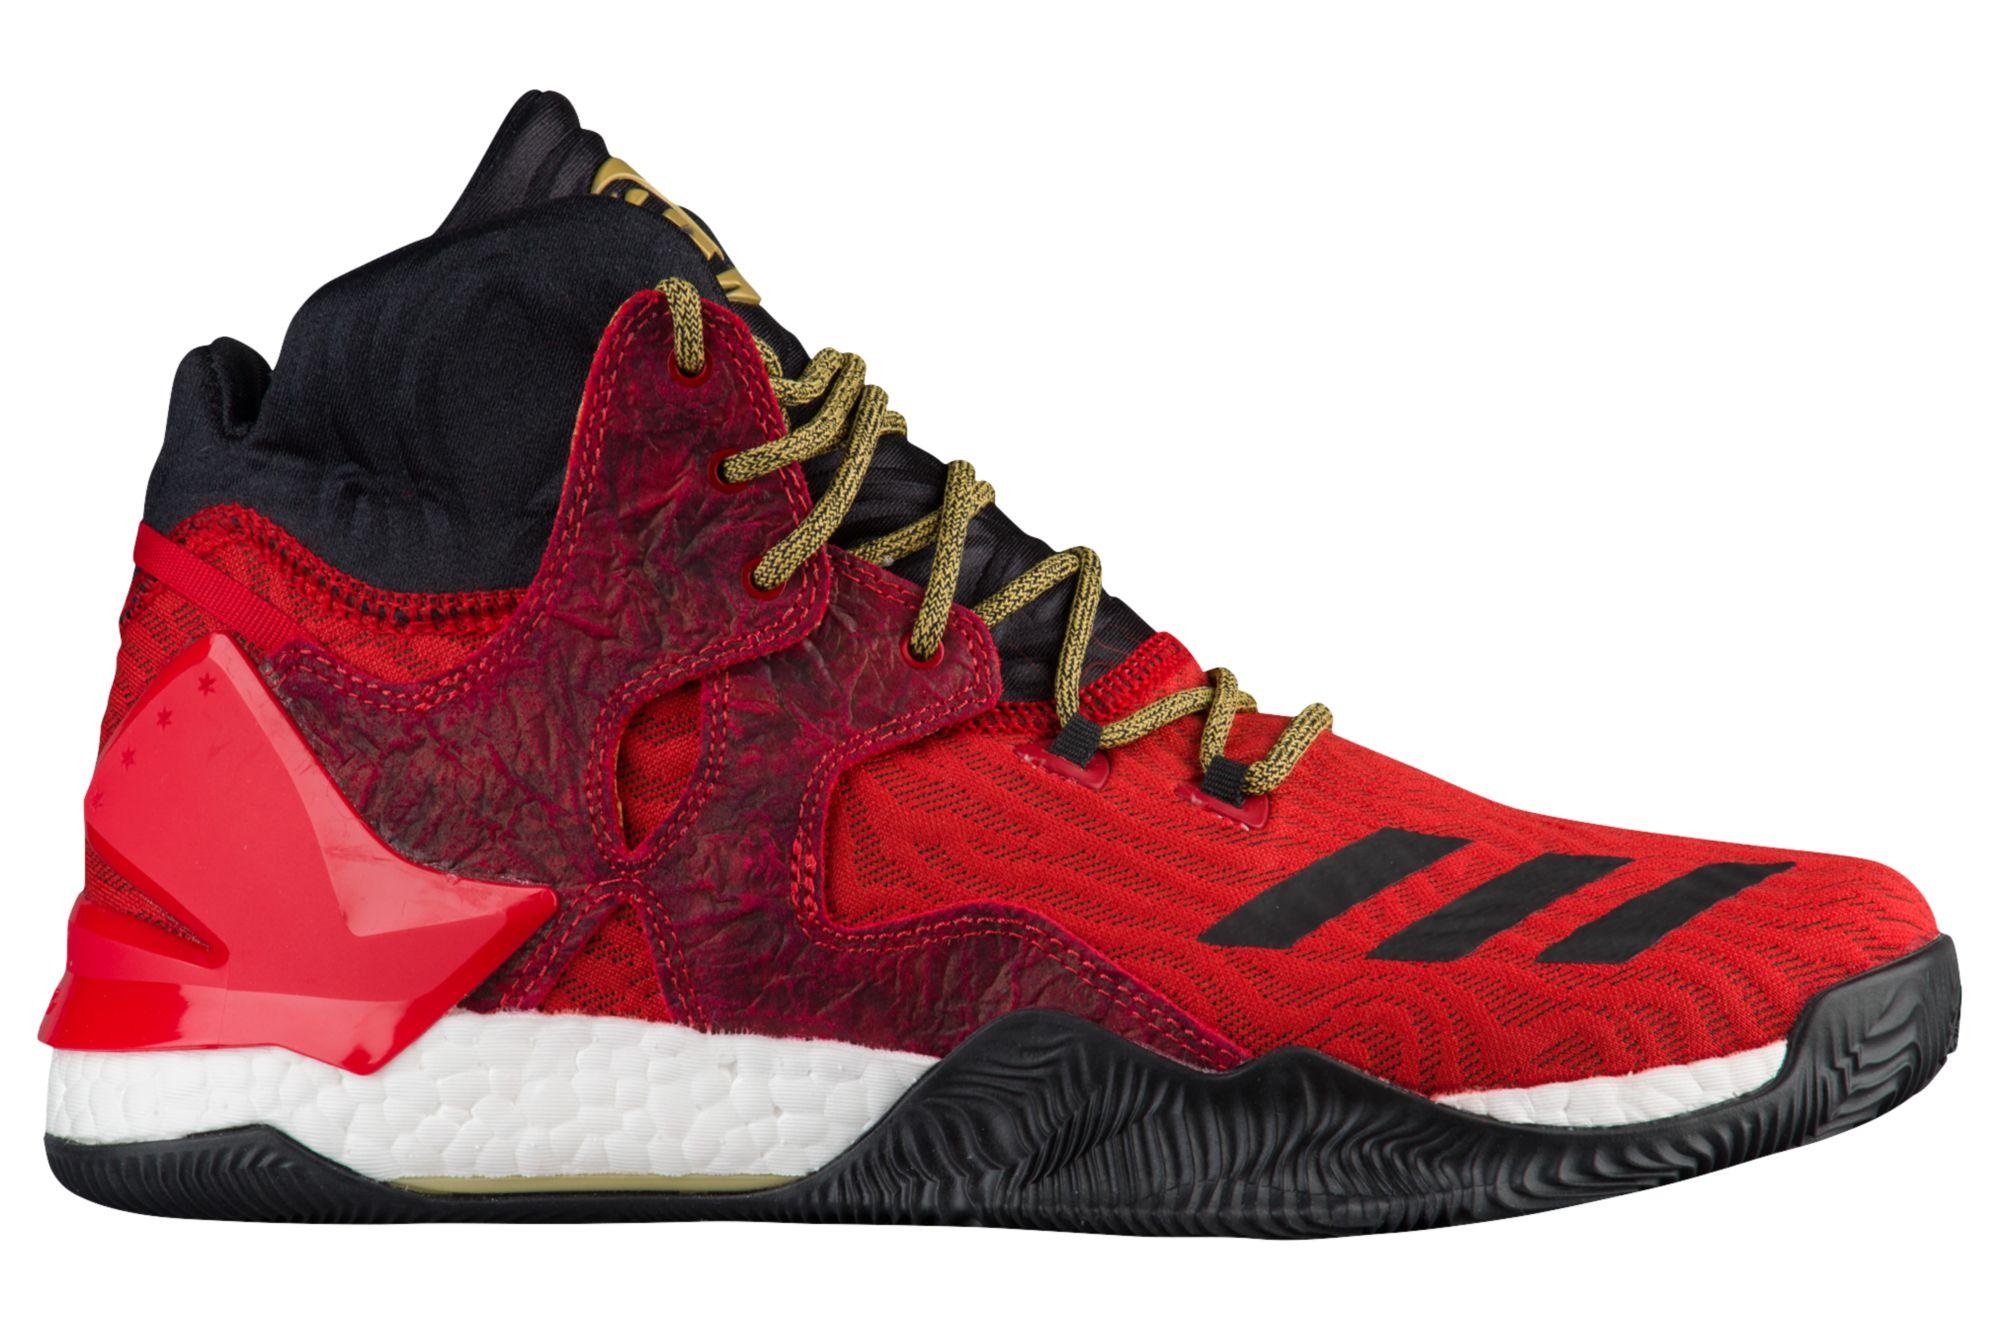 new adidas rose gold